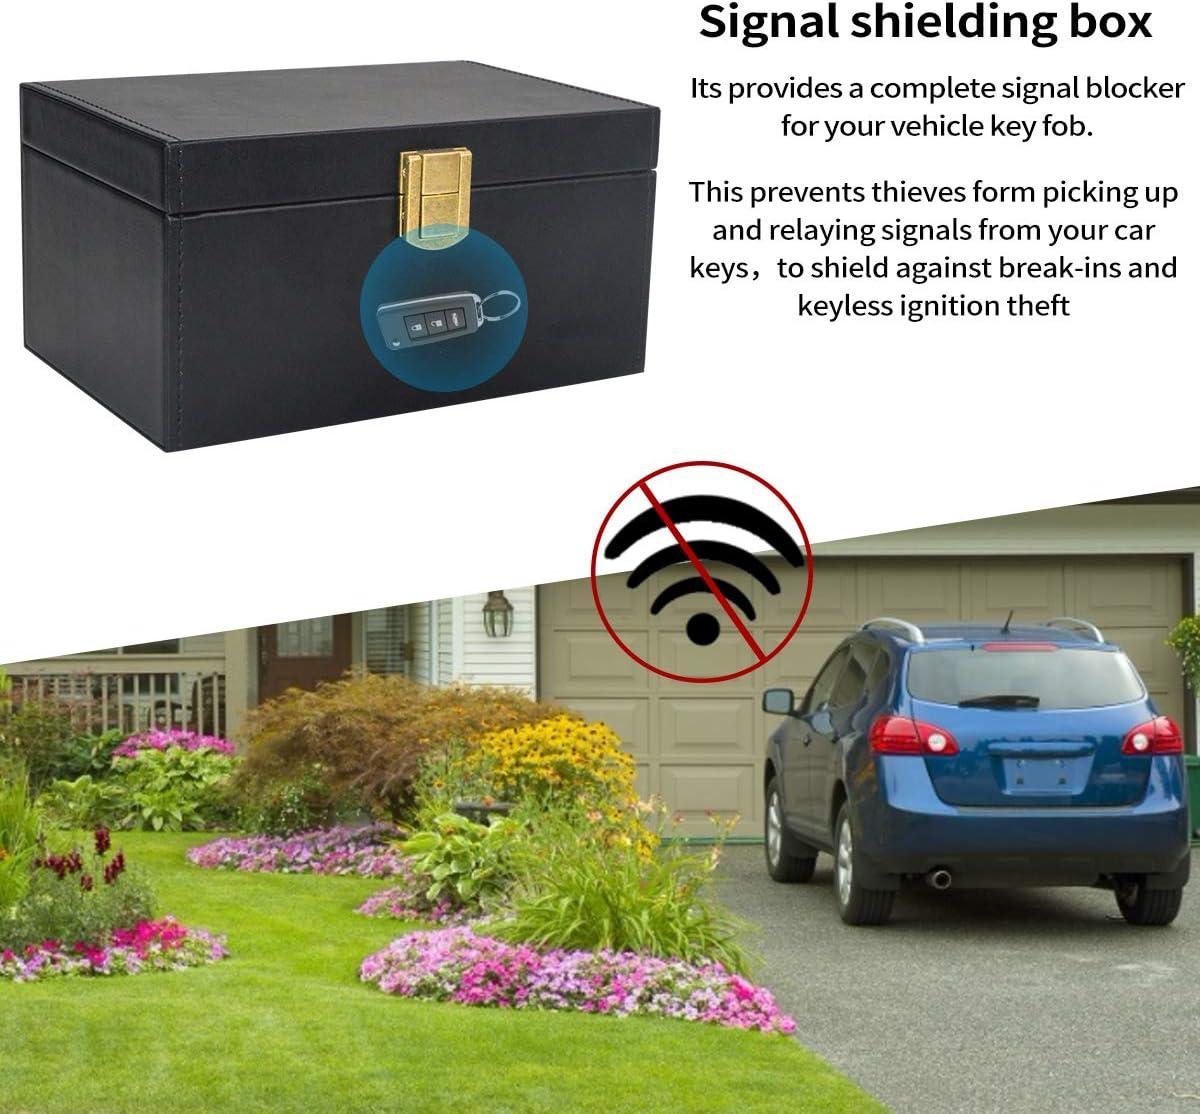 gro/ße Autoschl/üssel-Signalblocker-Box Schl/üssellose Tasche Qcore Faraday Box f/ür Autoschl/üssel Faraday-K/äfig Anti-Diebstahl-Leder RFID-Kfz-Schl/üsselanh/änger-Handy-Kartenbox